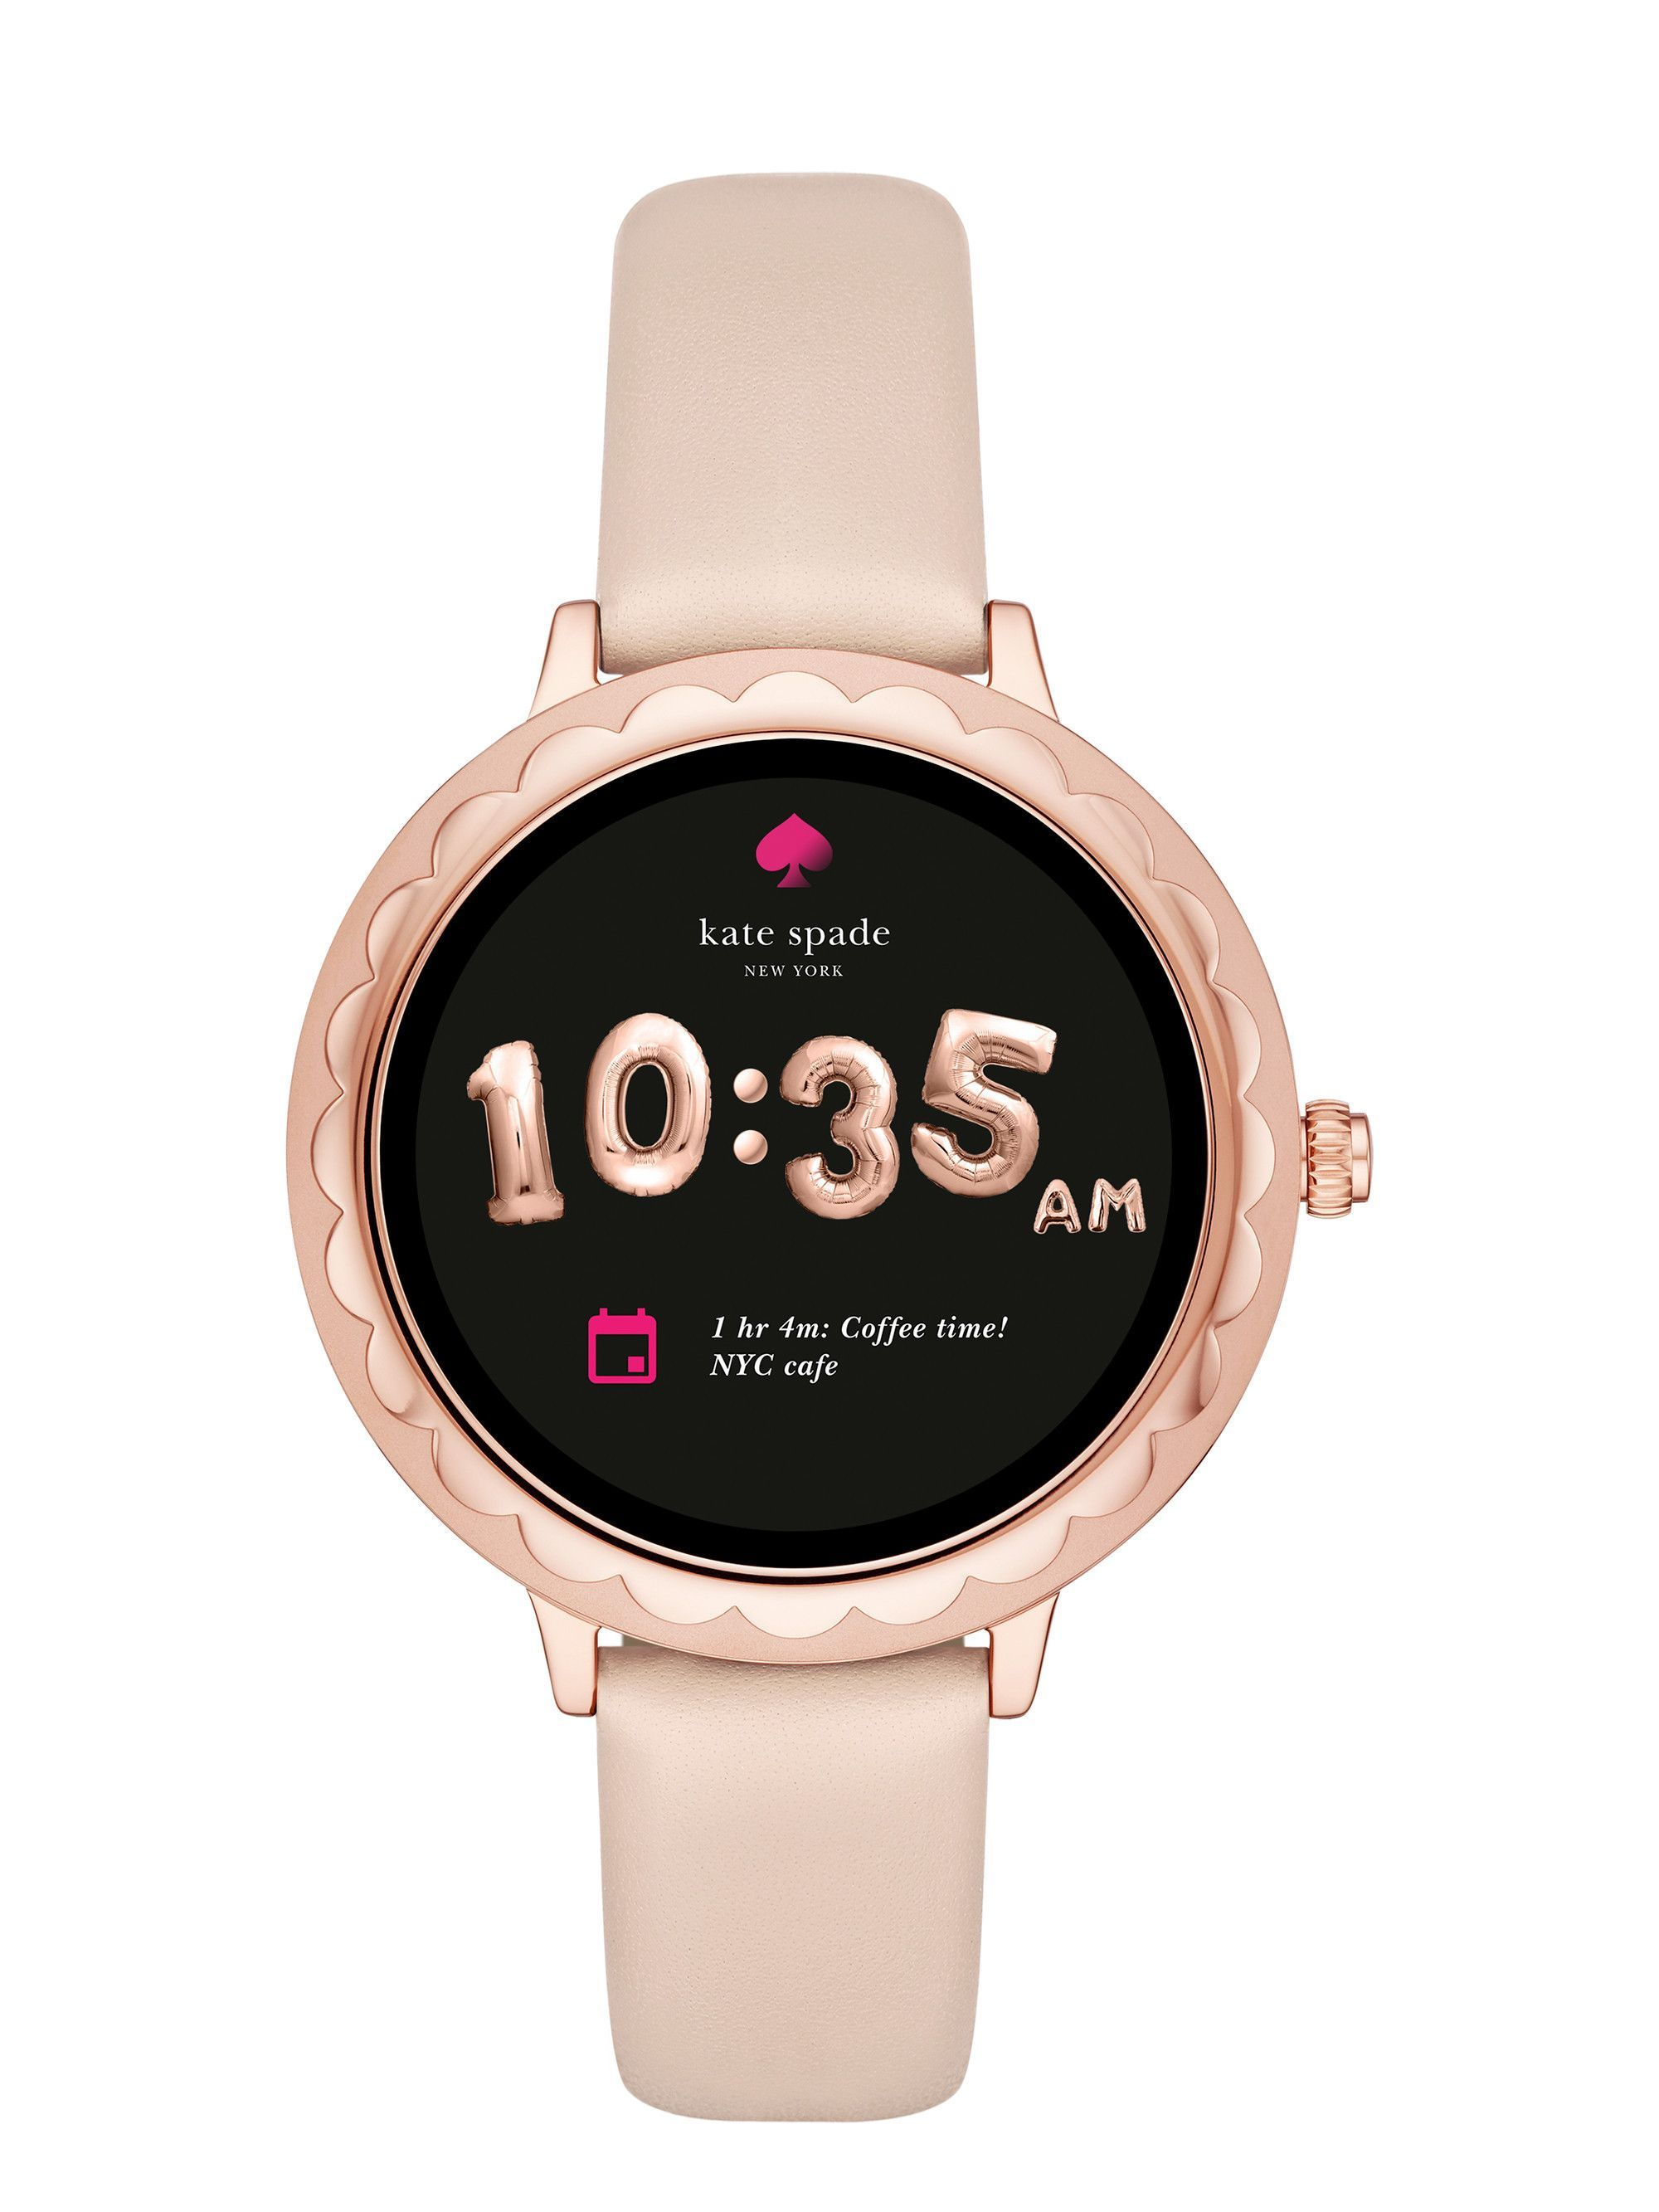 cc6189e19ac Kate Spade Scallop Touchscreen Smart Watch